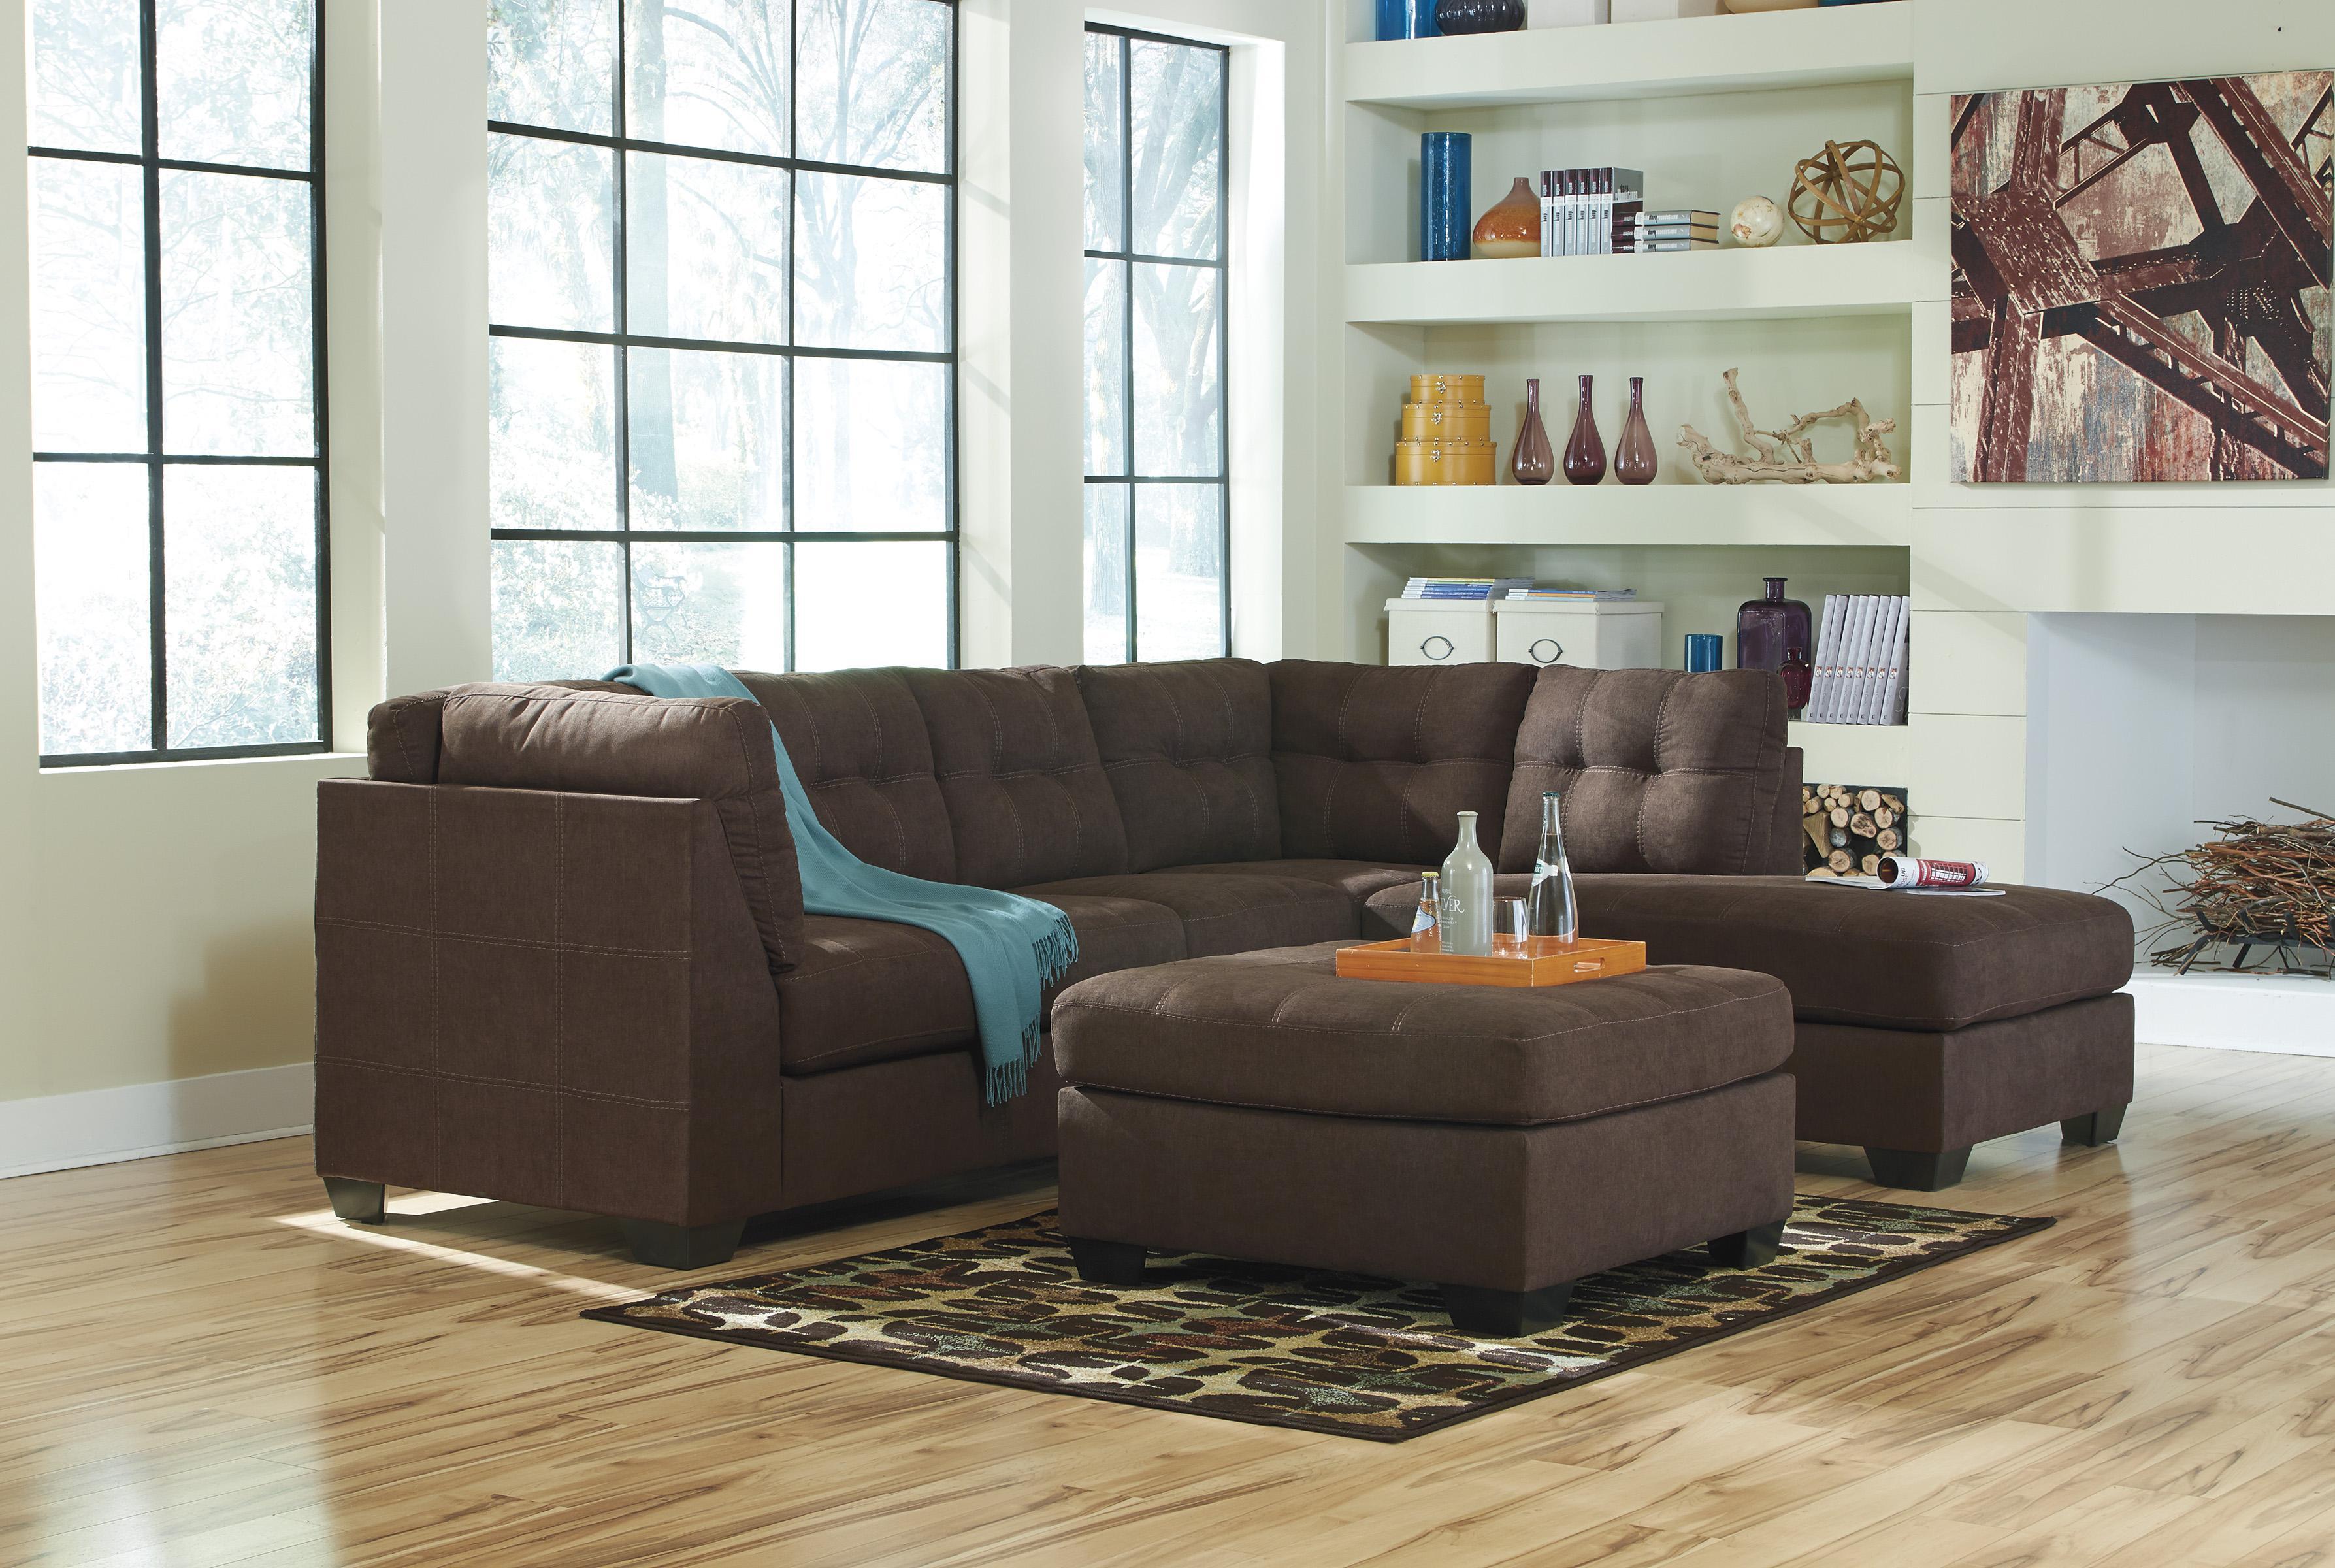 walnut furniture living room hammock benchcraft by ashley maier stationary group